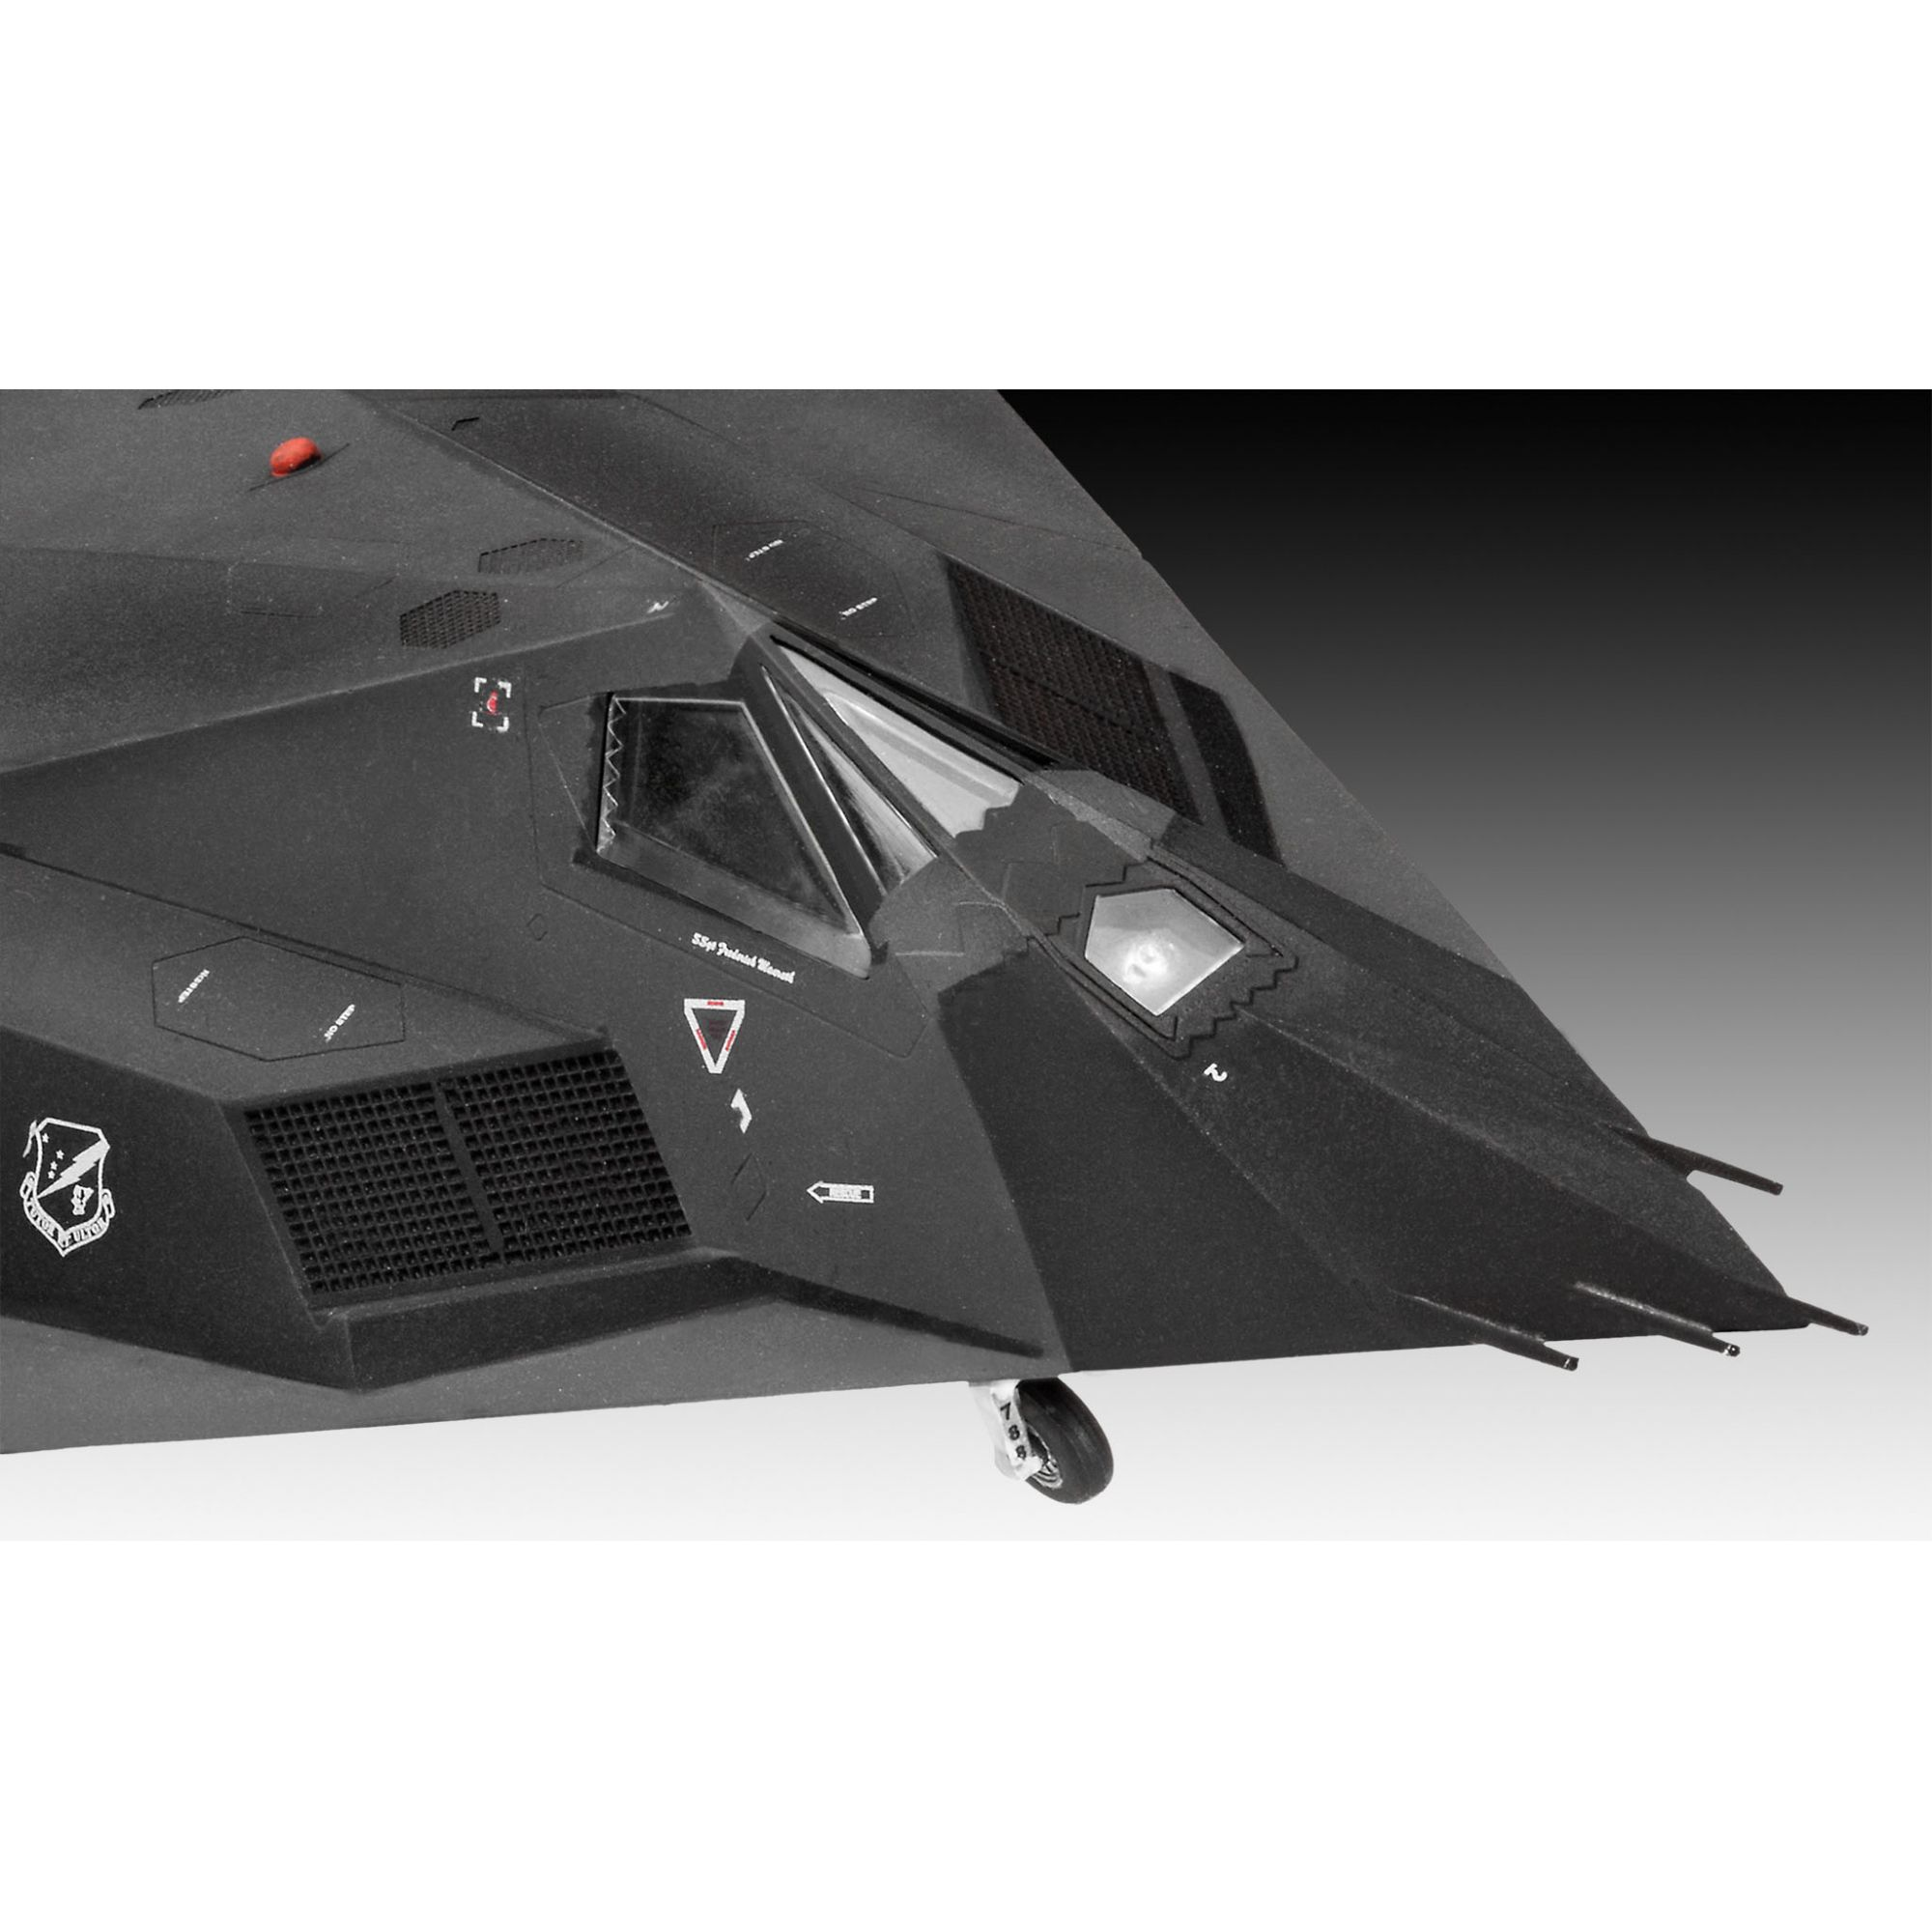 Model Set Lockheed Martin F-117A Nighthawk - 1/72 - Revell 63899  - BLIMPS COMÉRCIO ELETRÔNICO